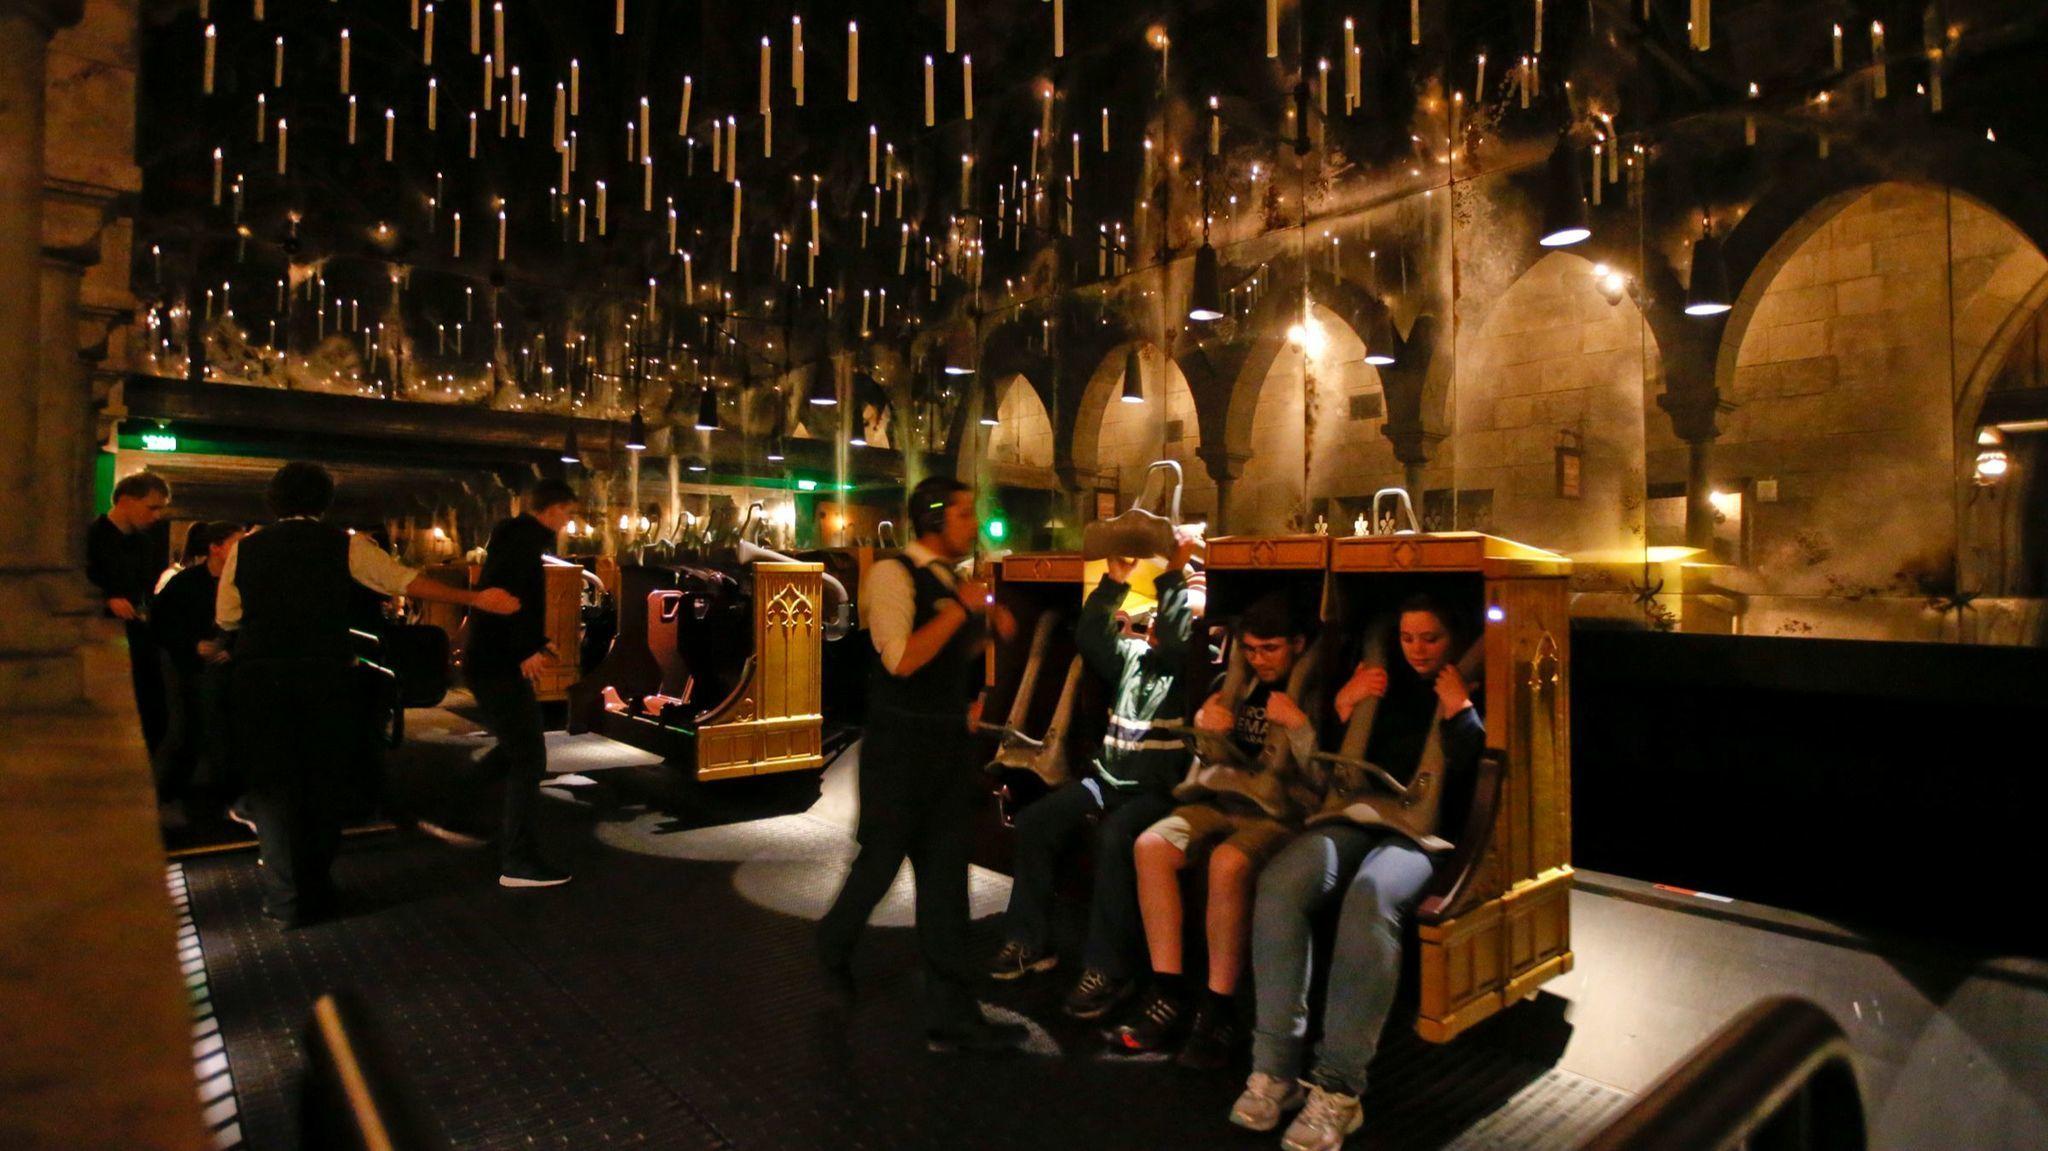 Harry Potter Ride At Universal Studios Hollywood Goes High Def Universal Studios Hollywood Harry Potter Ride Harry Potter Universal Studios